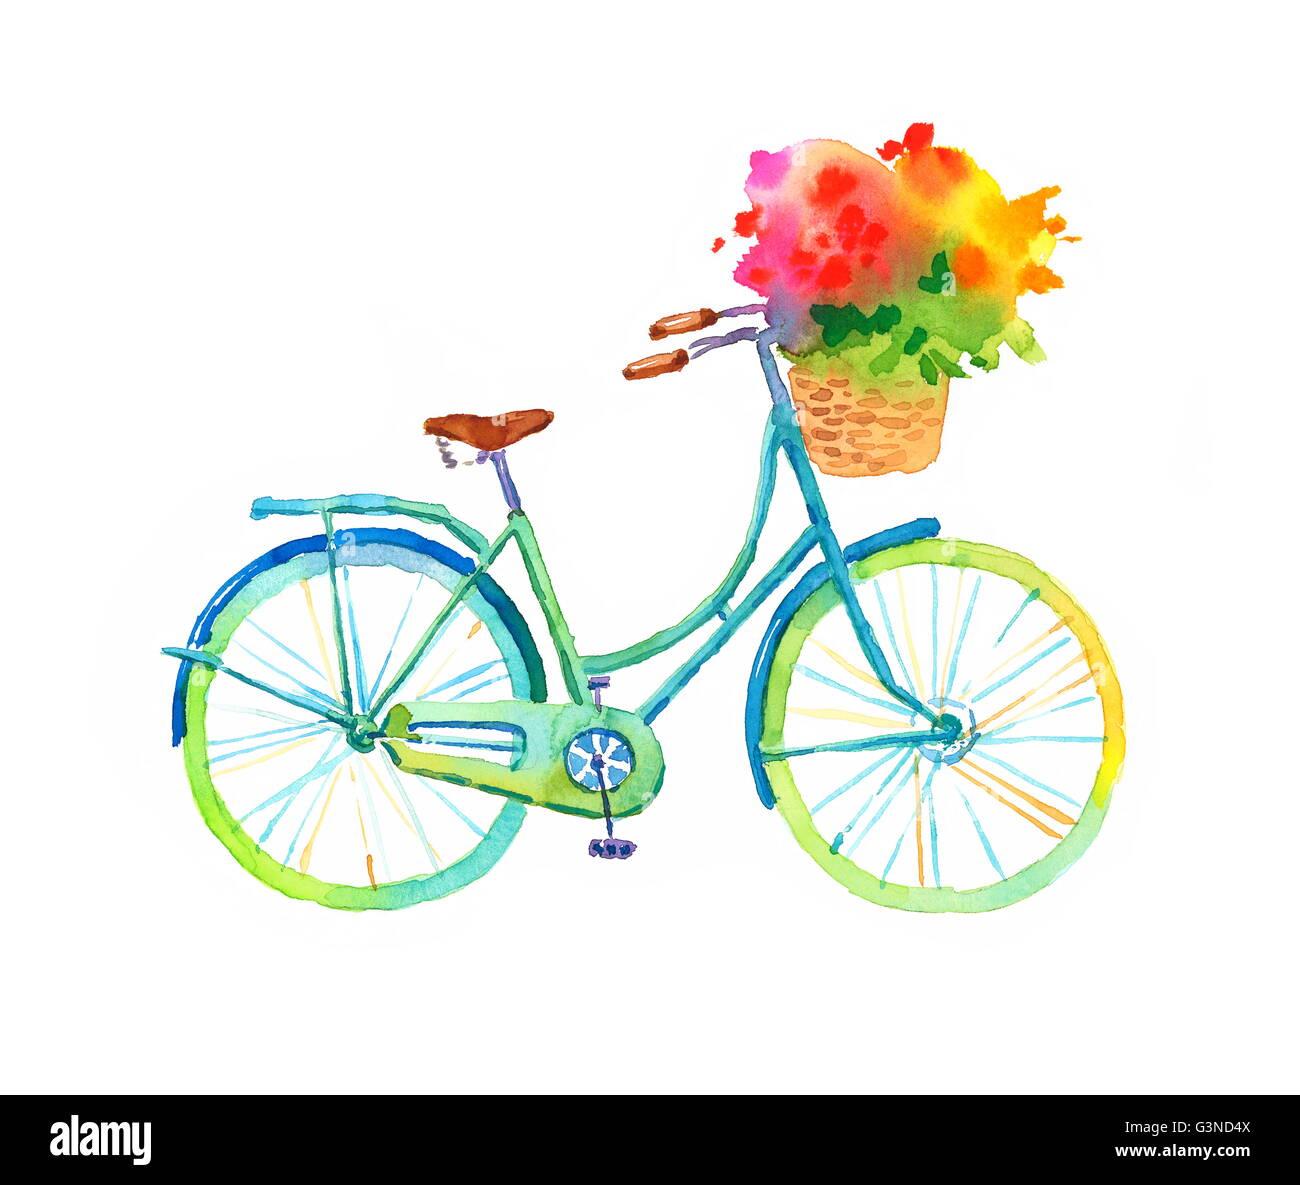 aquarell blau fahrrad mit sch ne blume korb hand gemalt. Black Bedroom Furniture Sets. Home Design Ideas